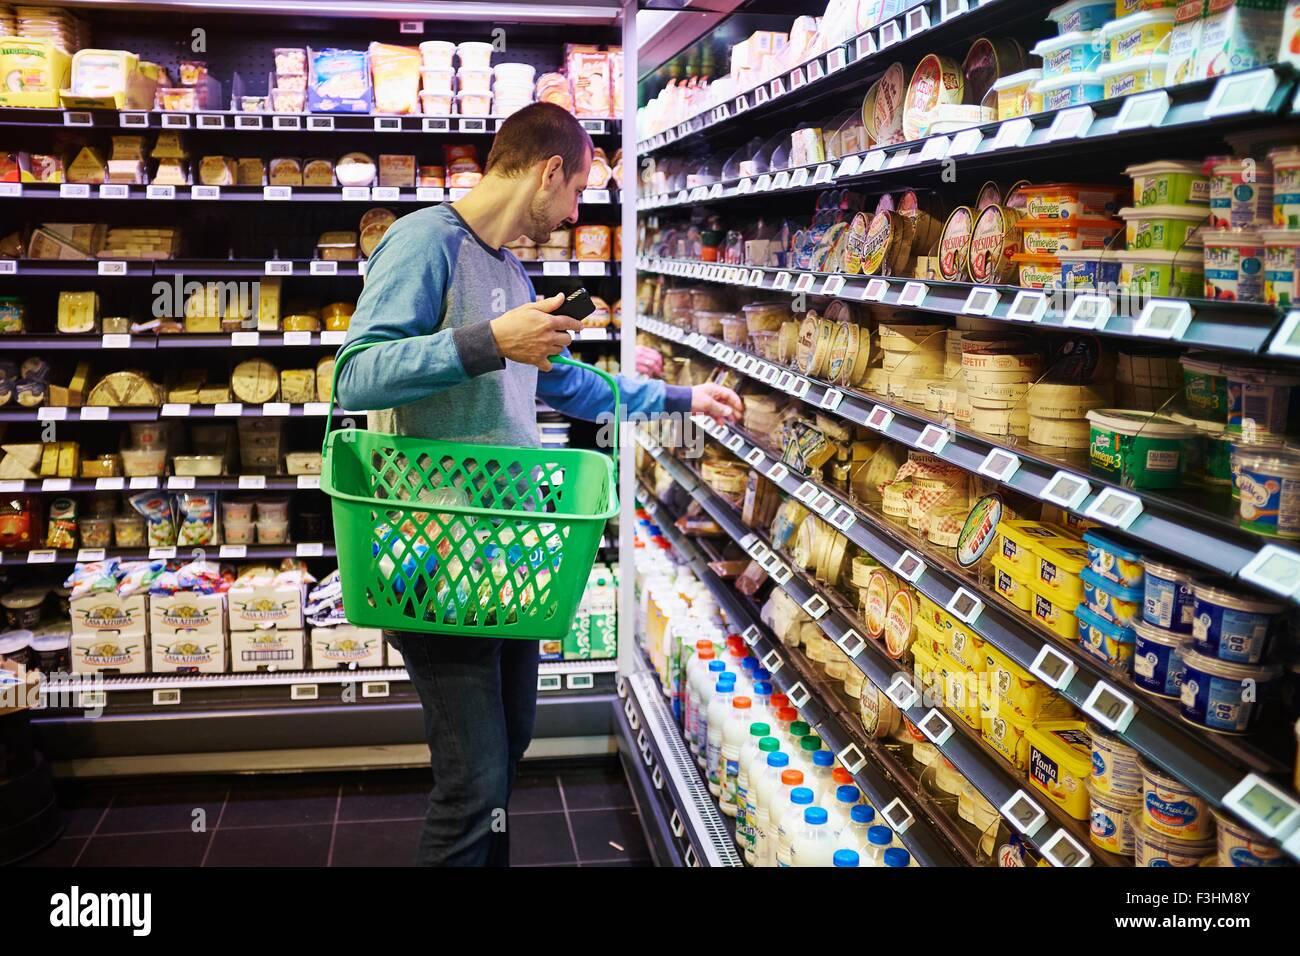 Man shopping in supermarket - Stock Image